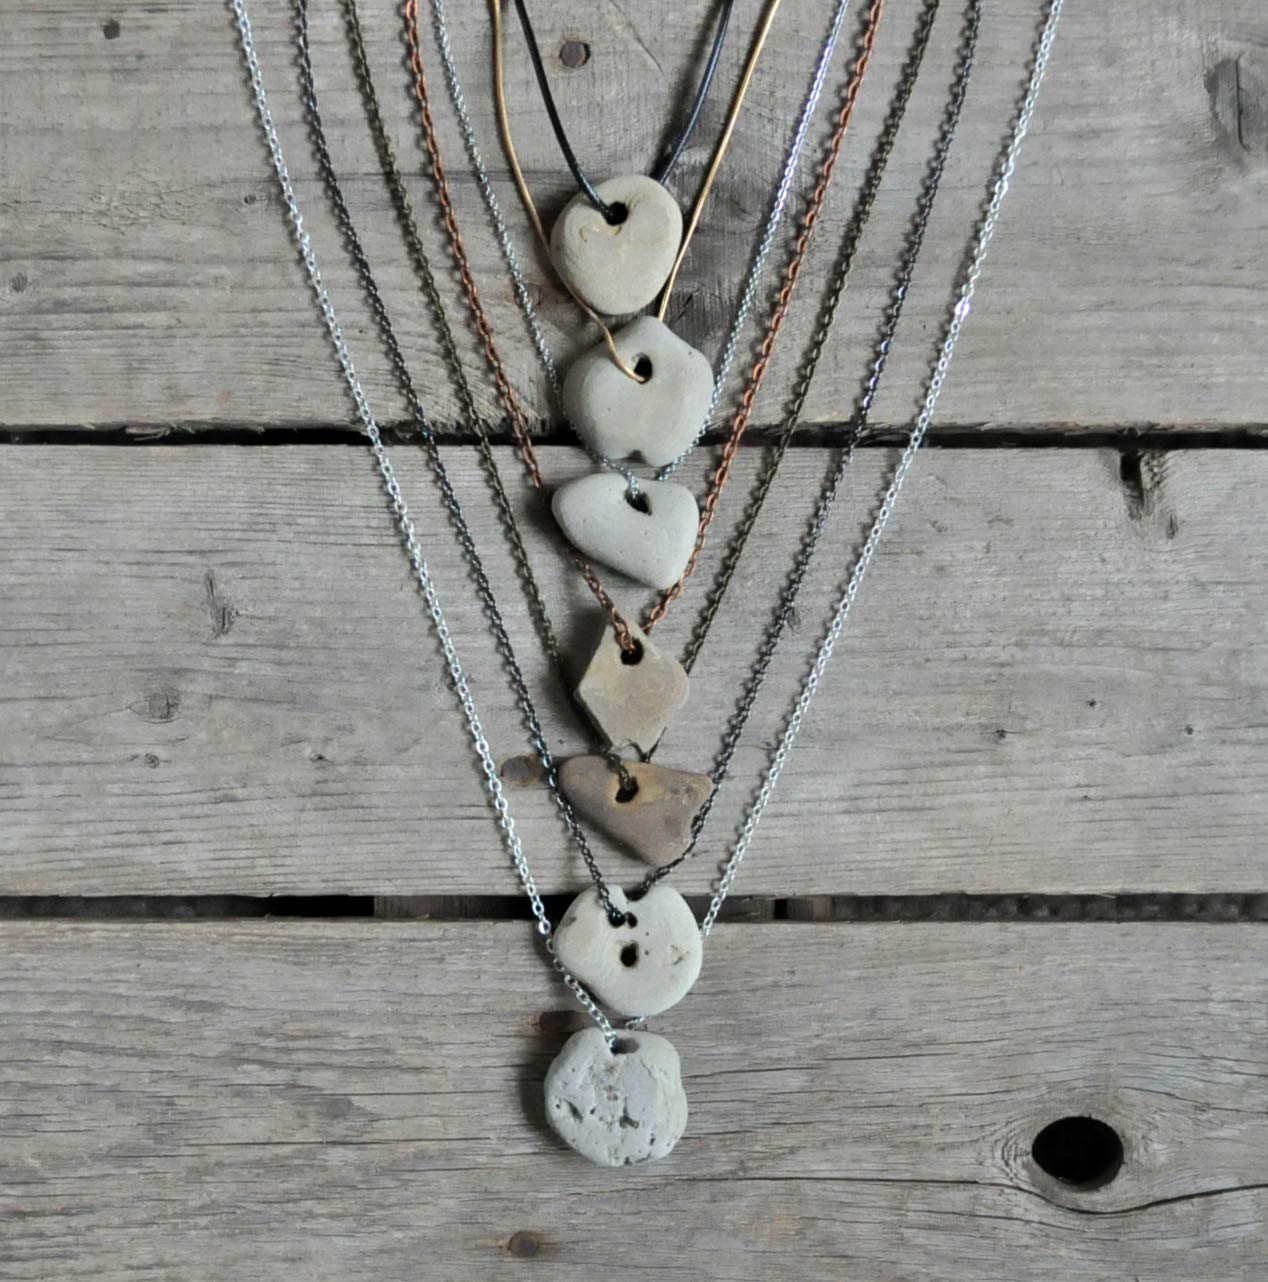 Naturally Holed Beach Stone Beach Stone Odin Stone Talisman Gift For Se Pebble with Natural Holes Hag Stone piedra de bruja